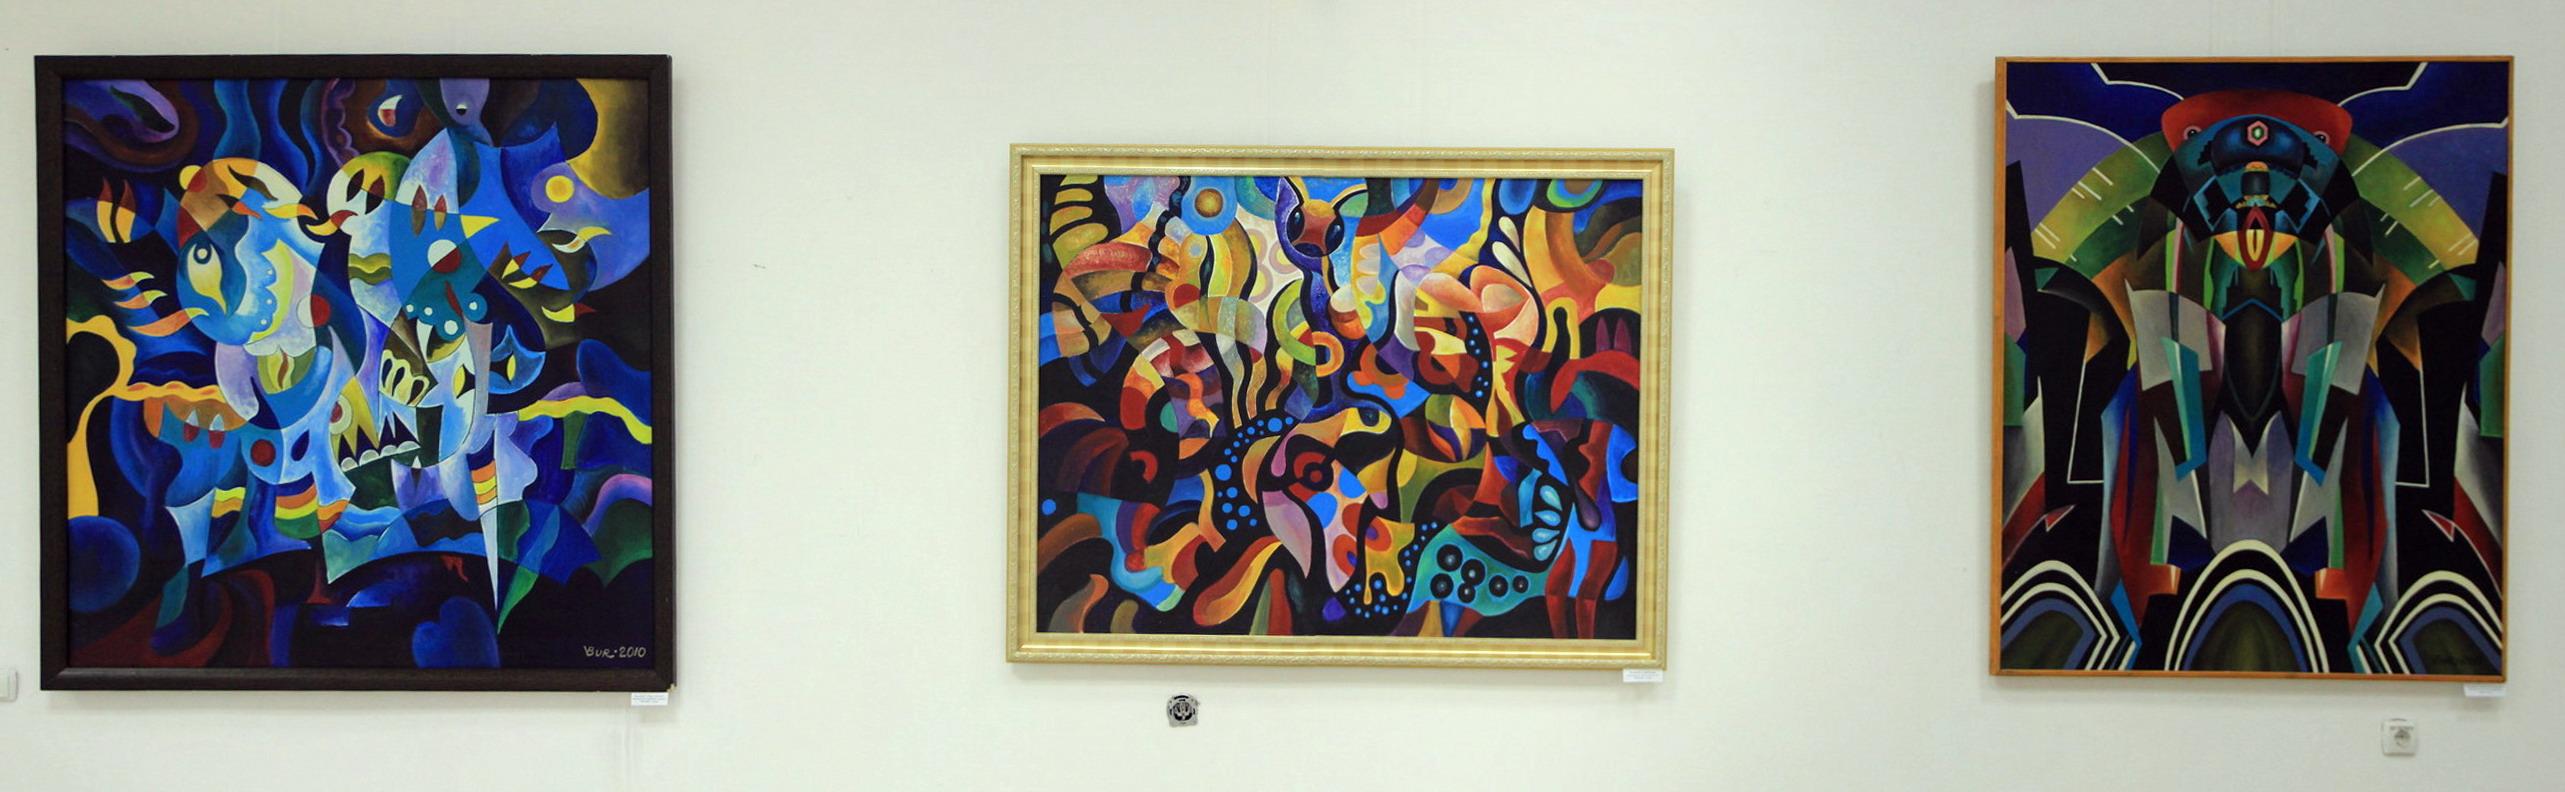 Экспозиция картин Владимира Бурмакина